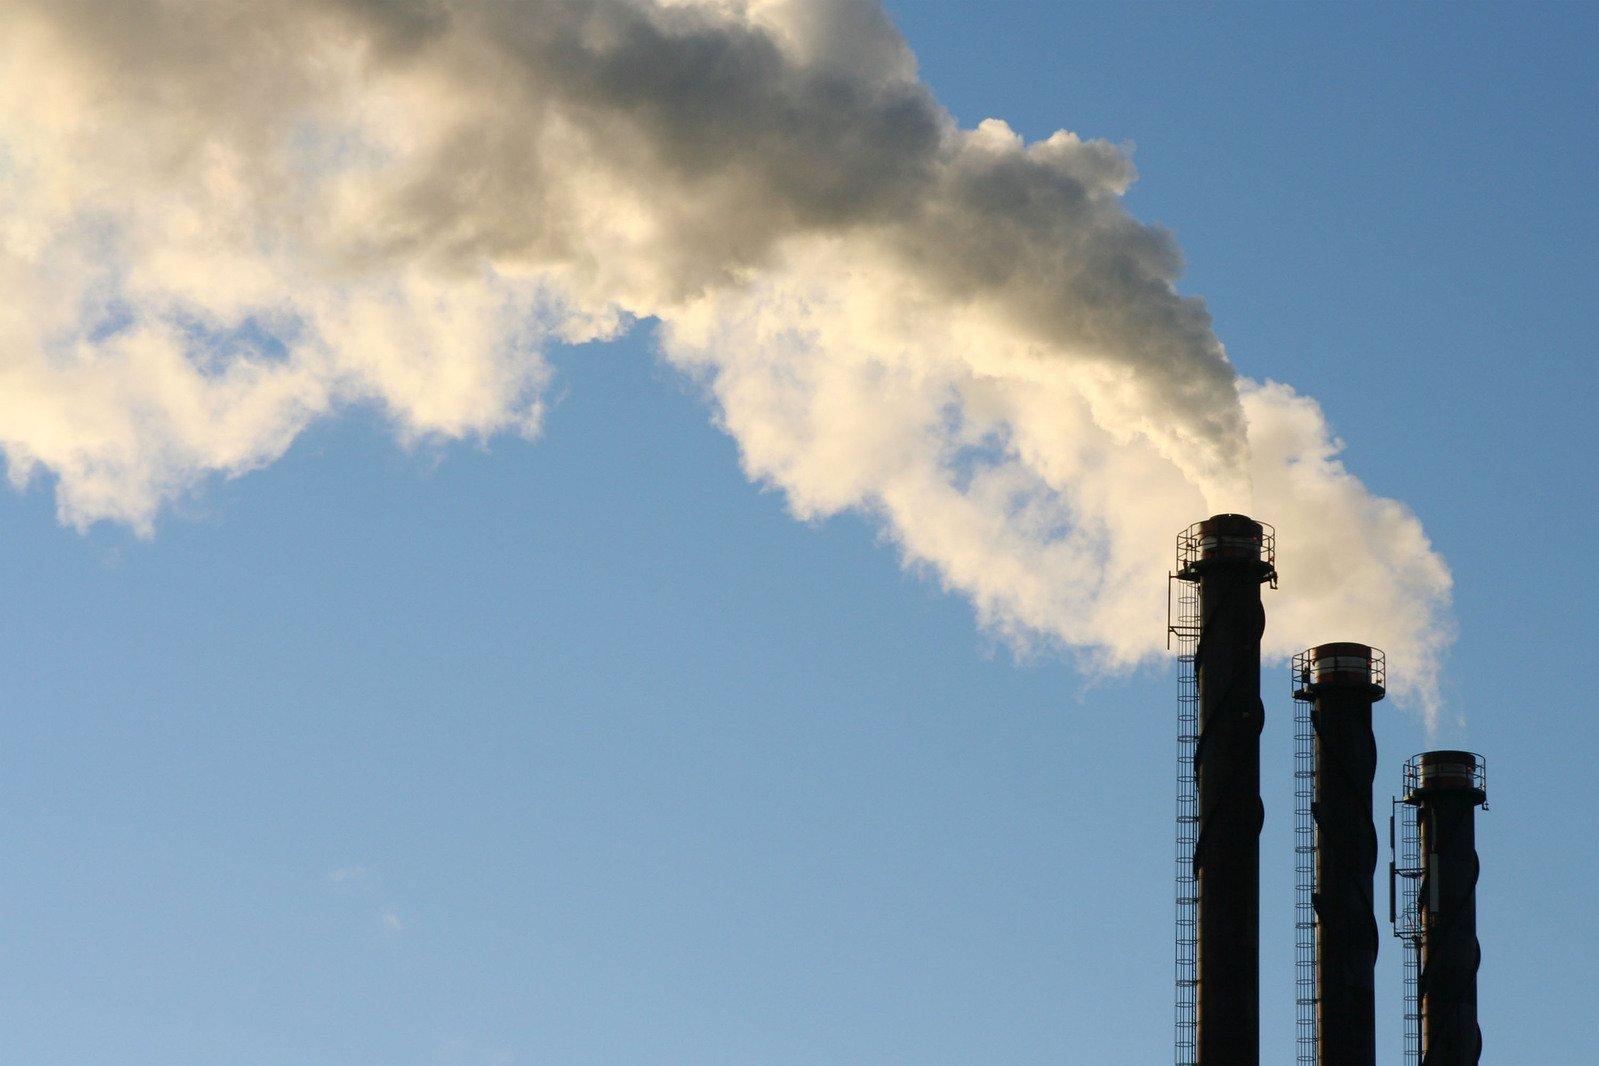 factory chimneys global warming